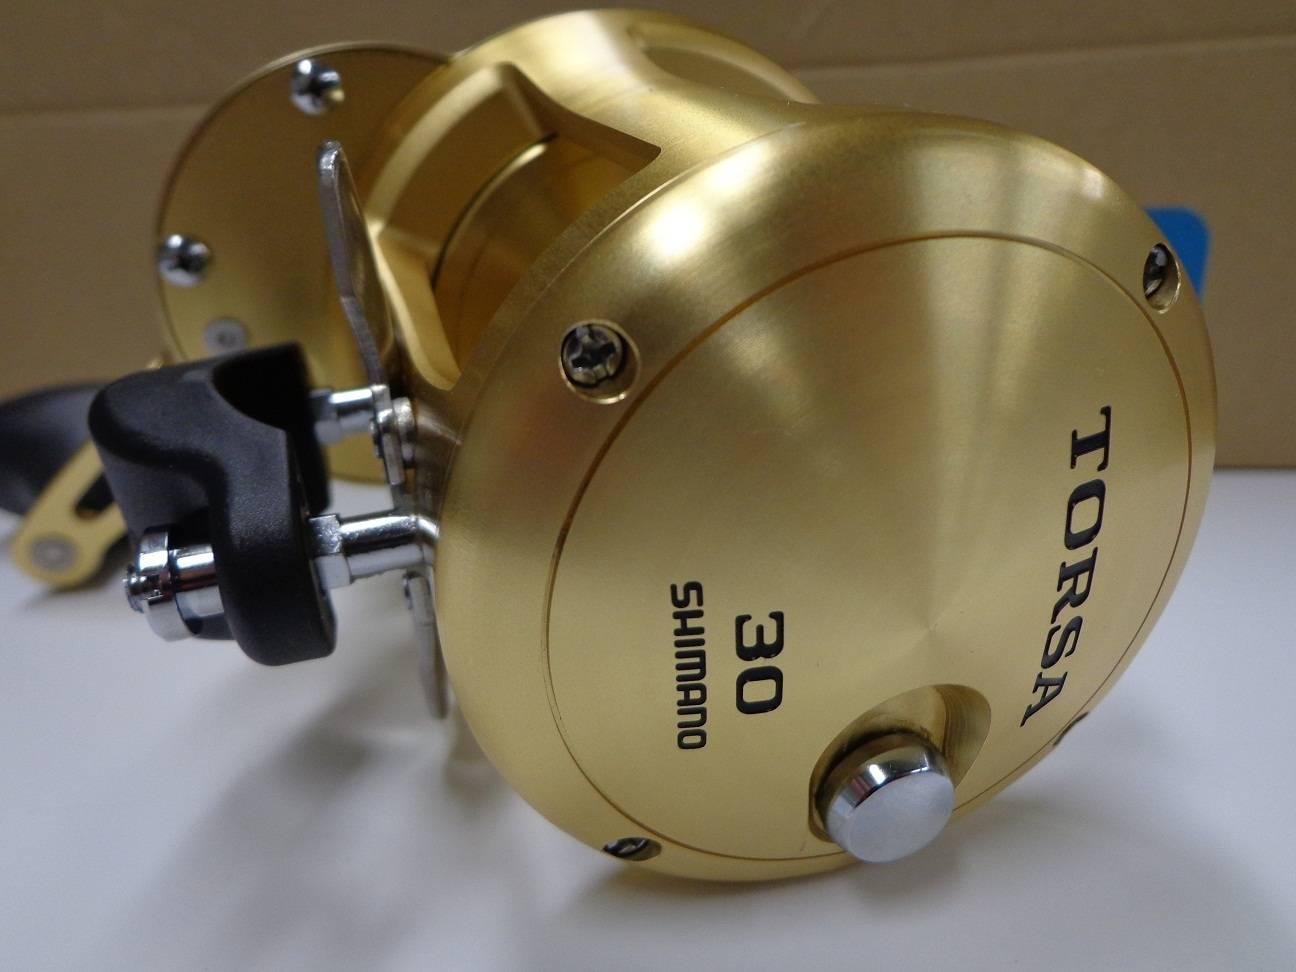 DSC08959.JPG